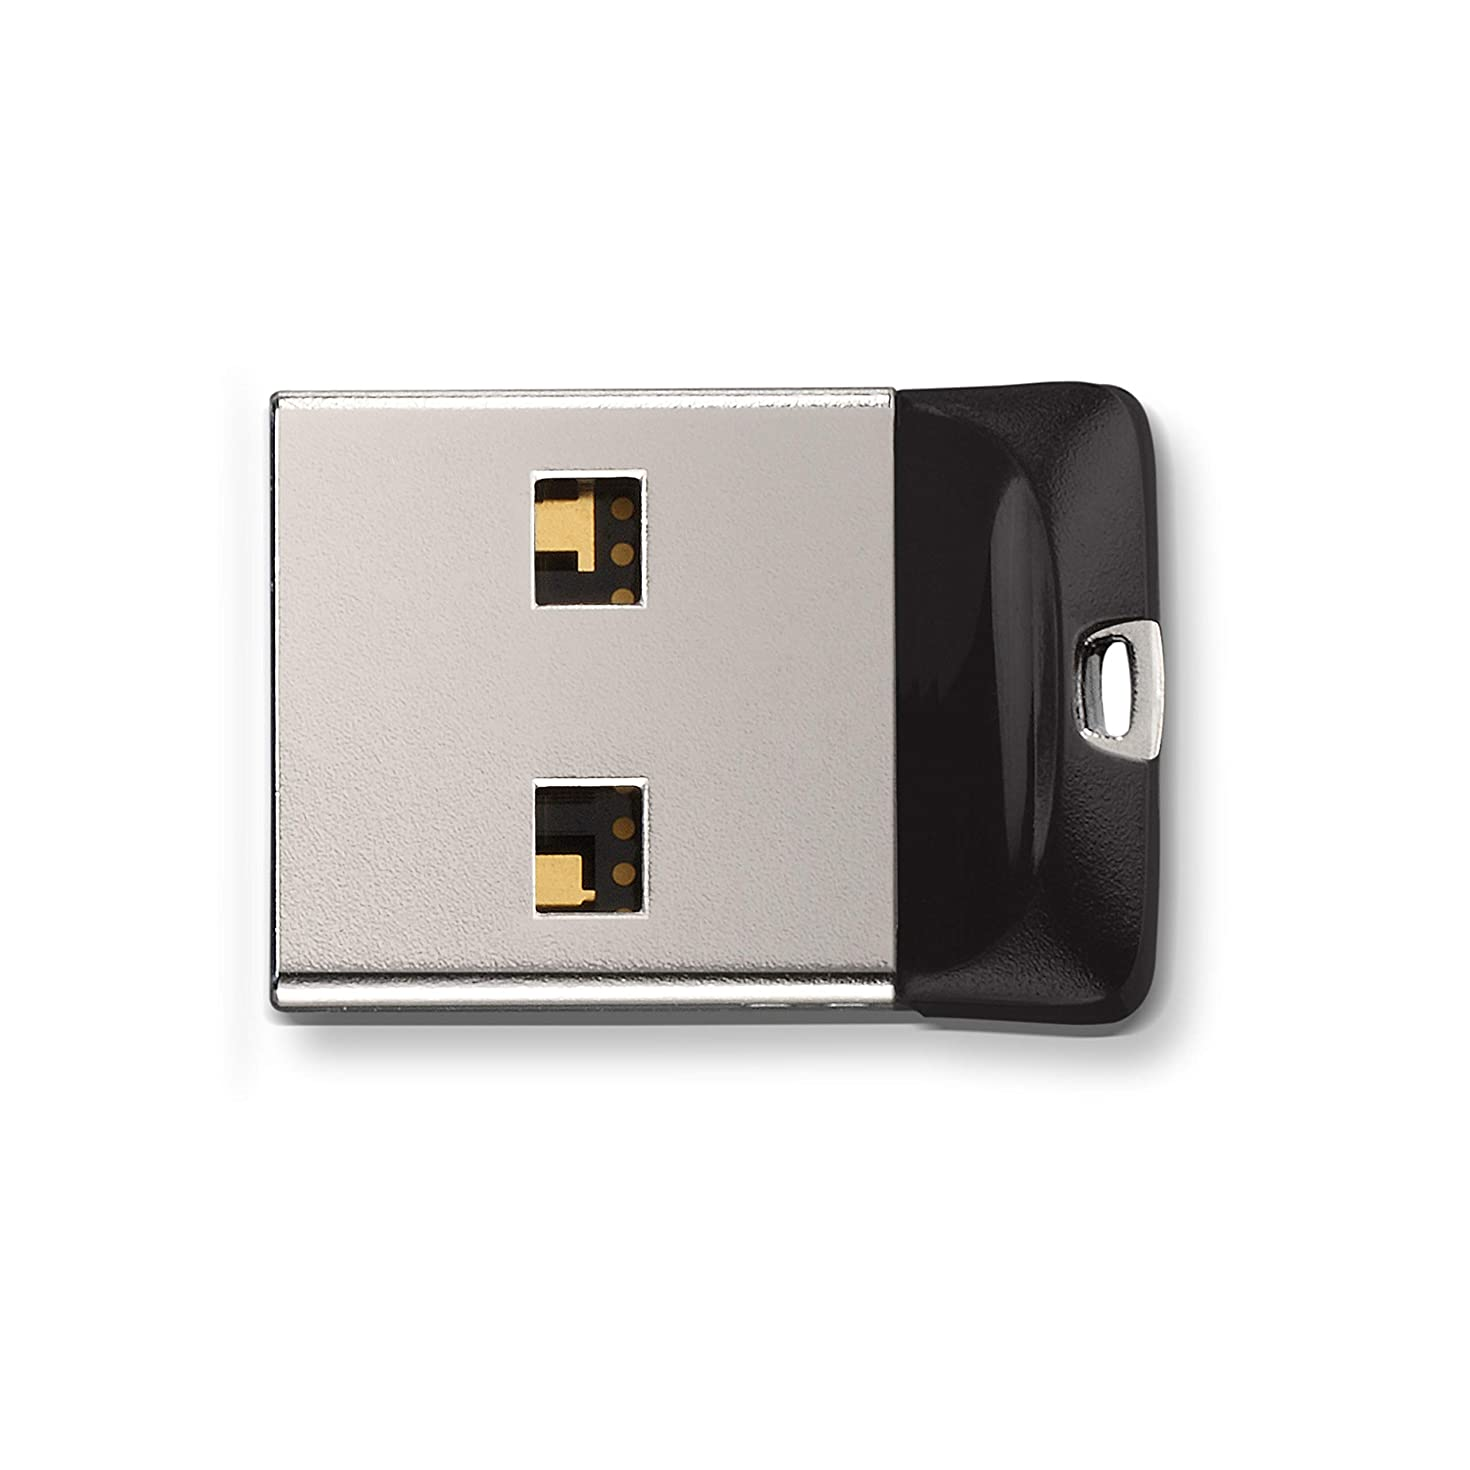 SanDisk 32GB Cruzer Fit USB Flash Drive - SDCZ33-032G-G35